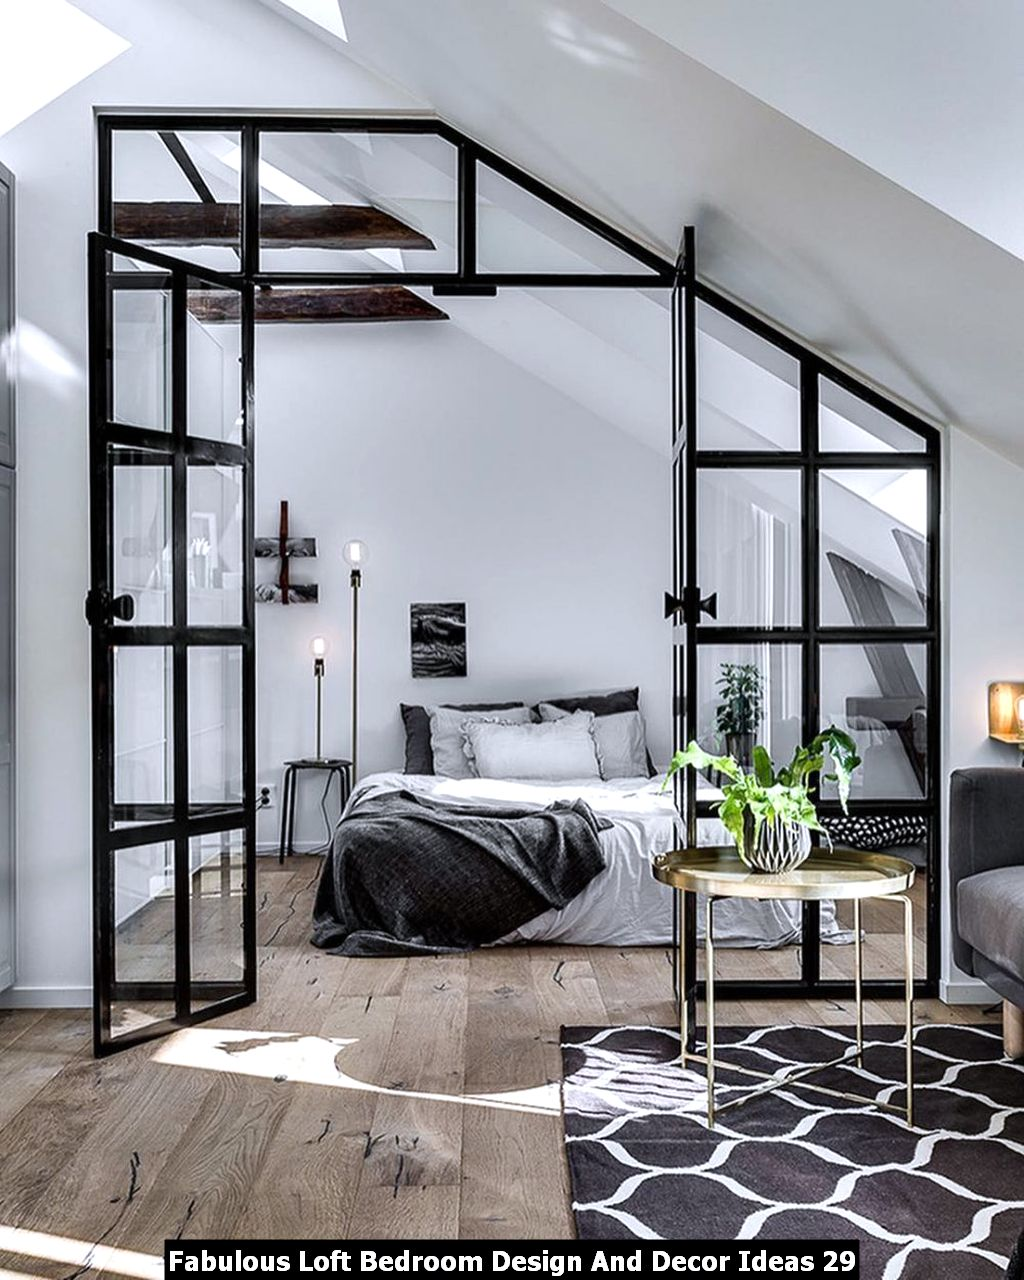 Fabulous Loft Bedroom Design And Decor Ideas 29